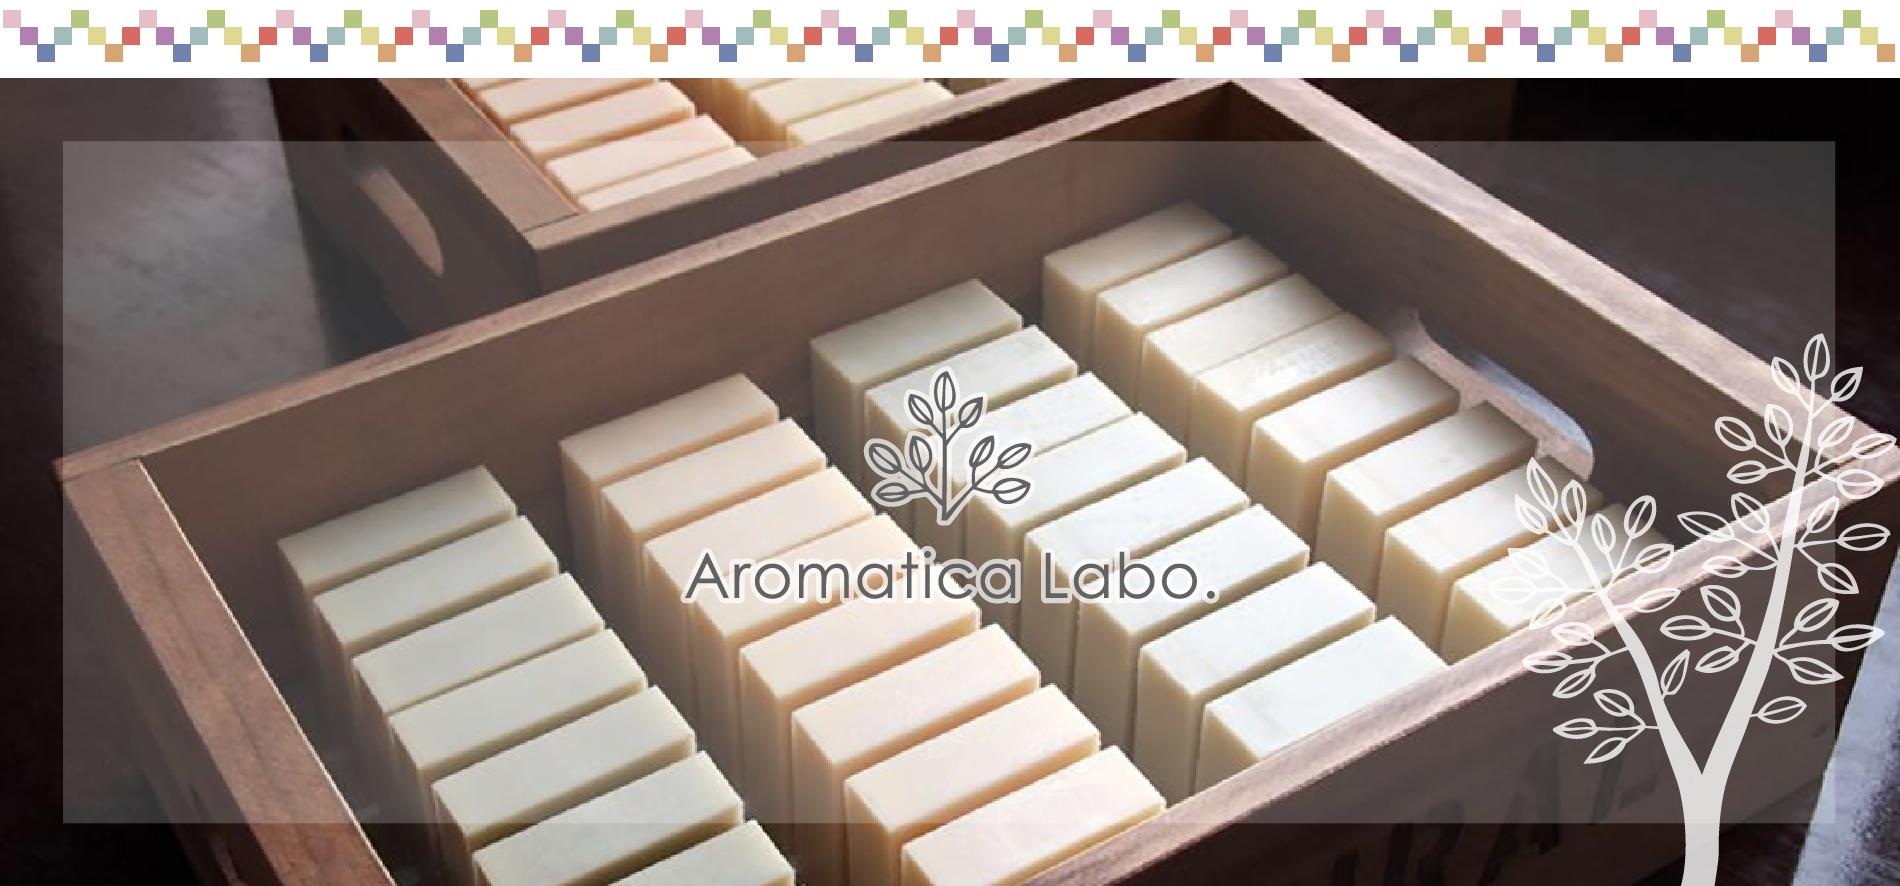 OEM化粧石鹸宝石石鹸スイーツソープコールドプロセス製法MPソープ医薬品医療機器等法遵守